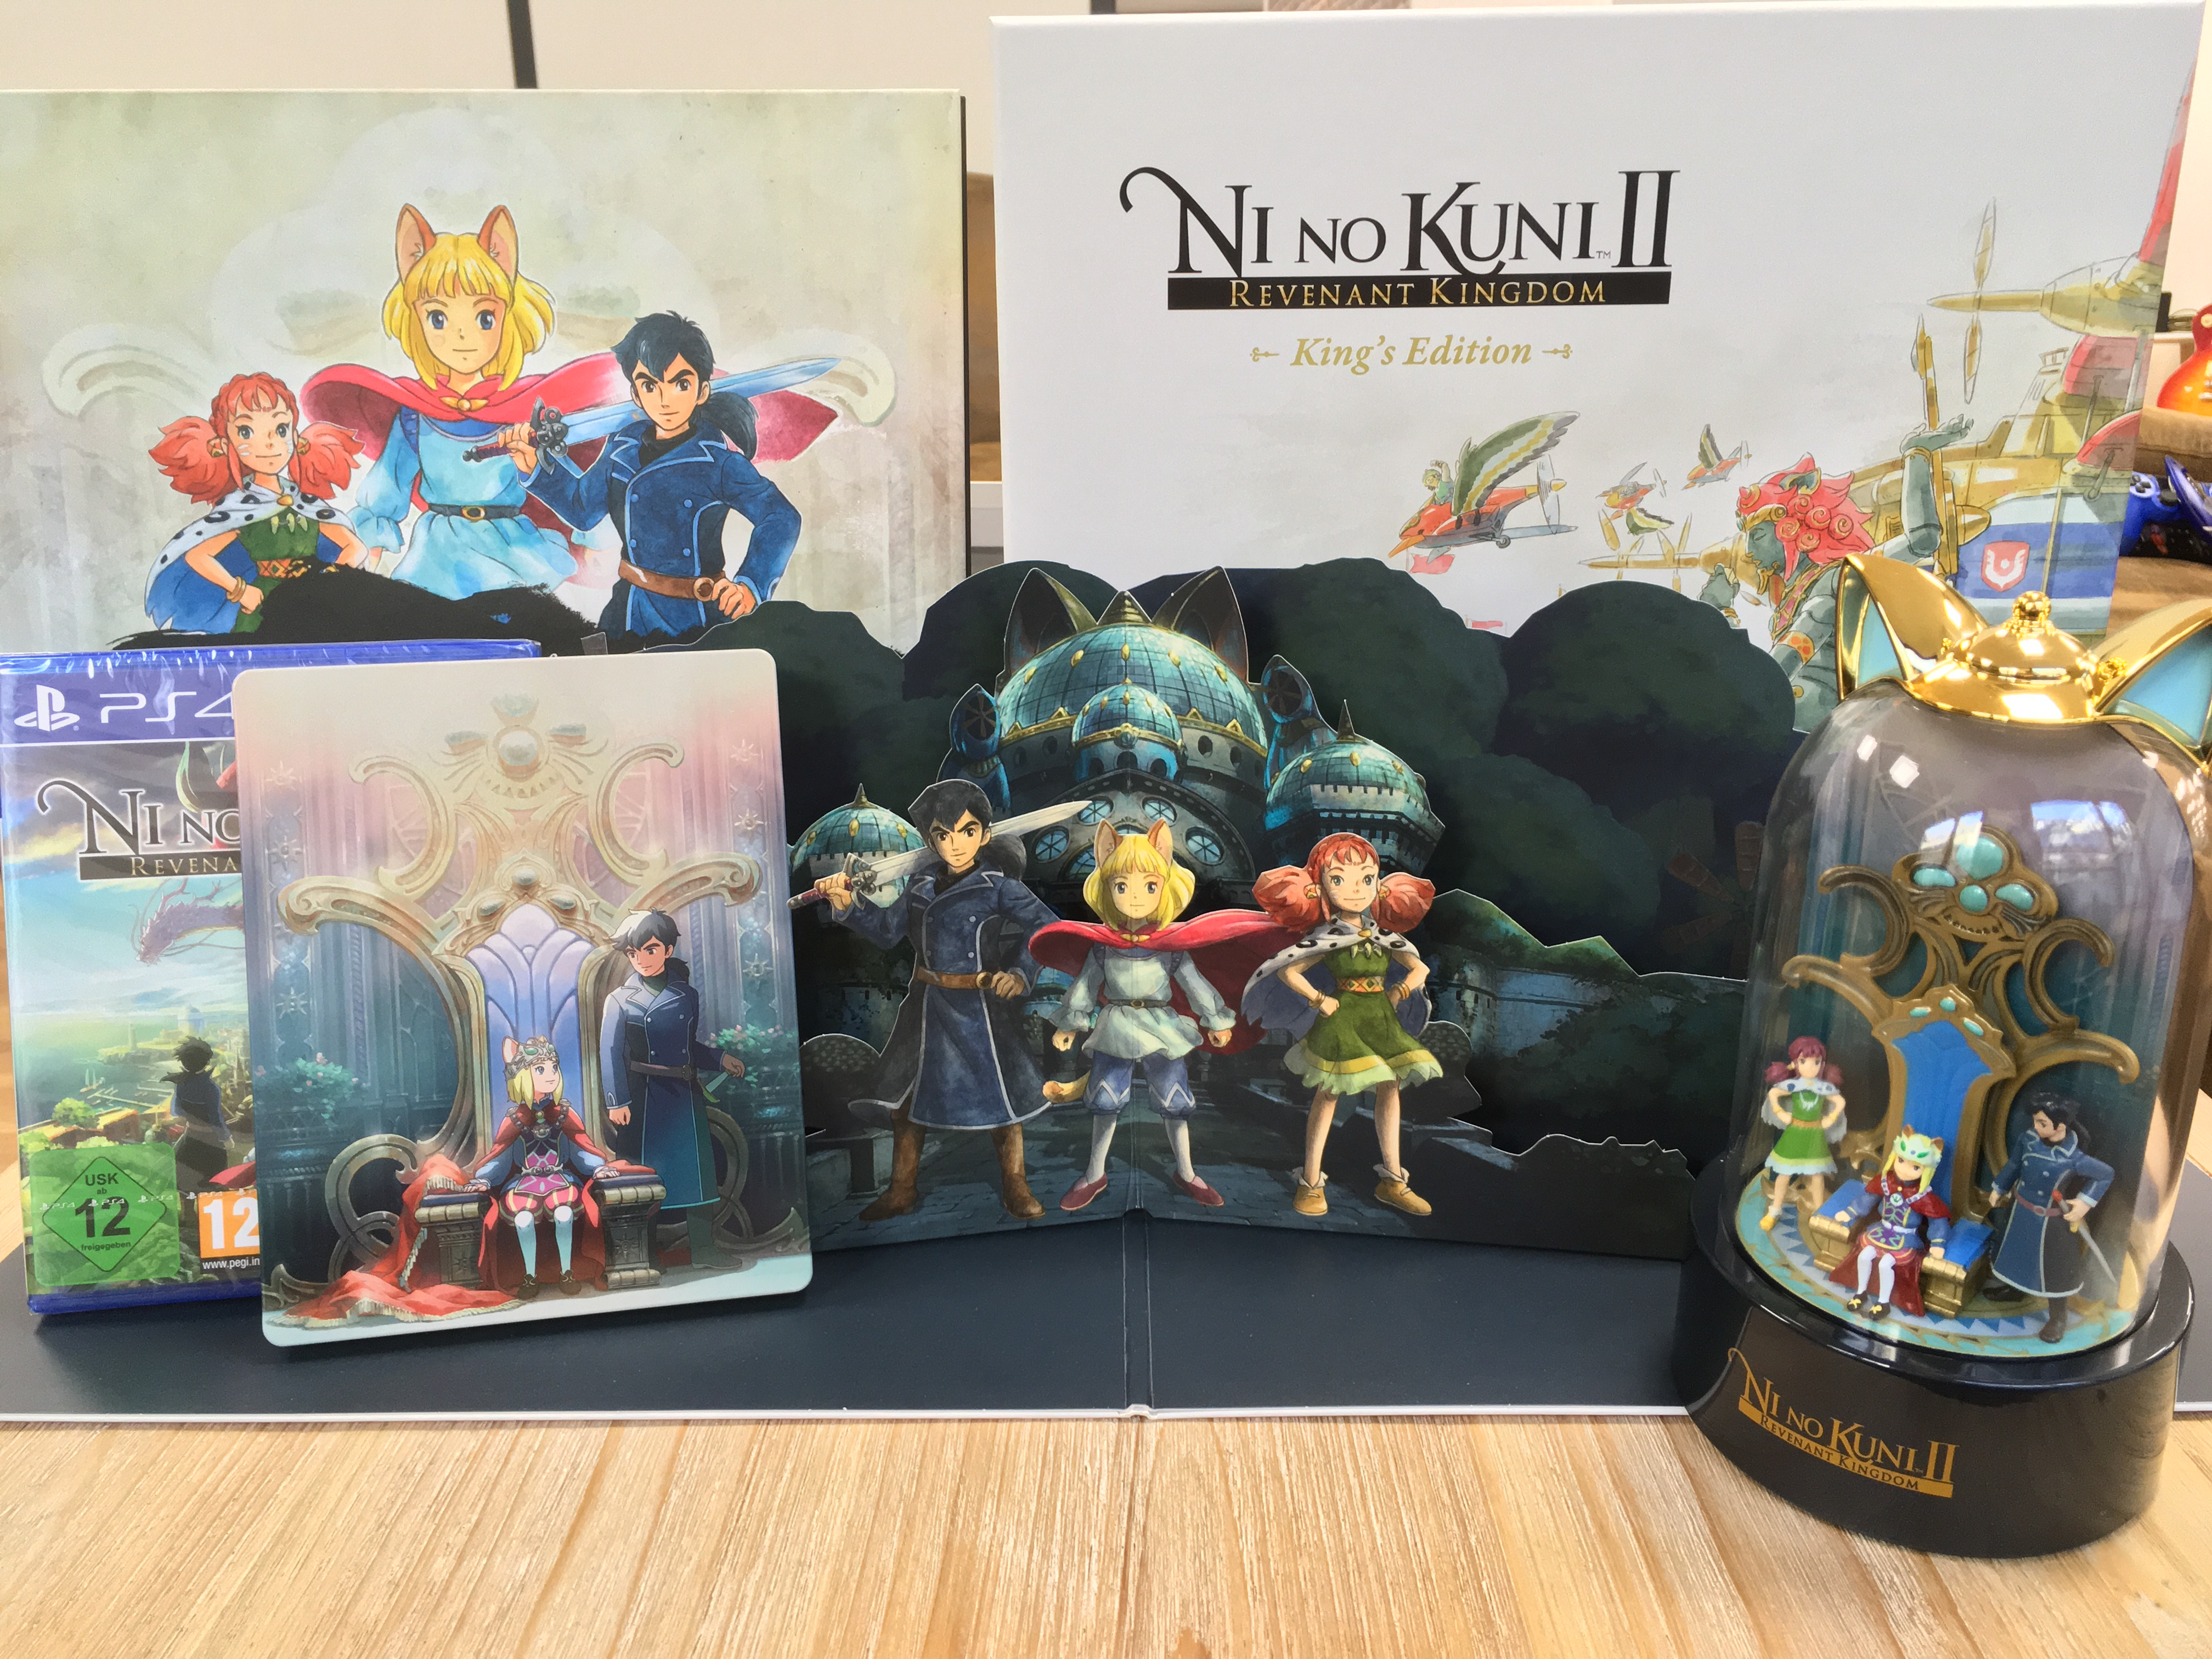 Ni No Kuni II King's Edition